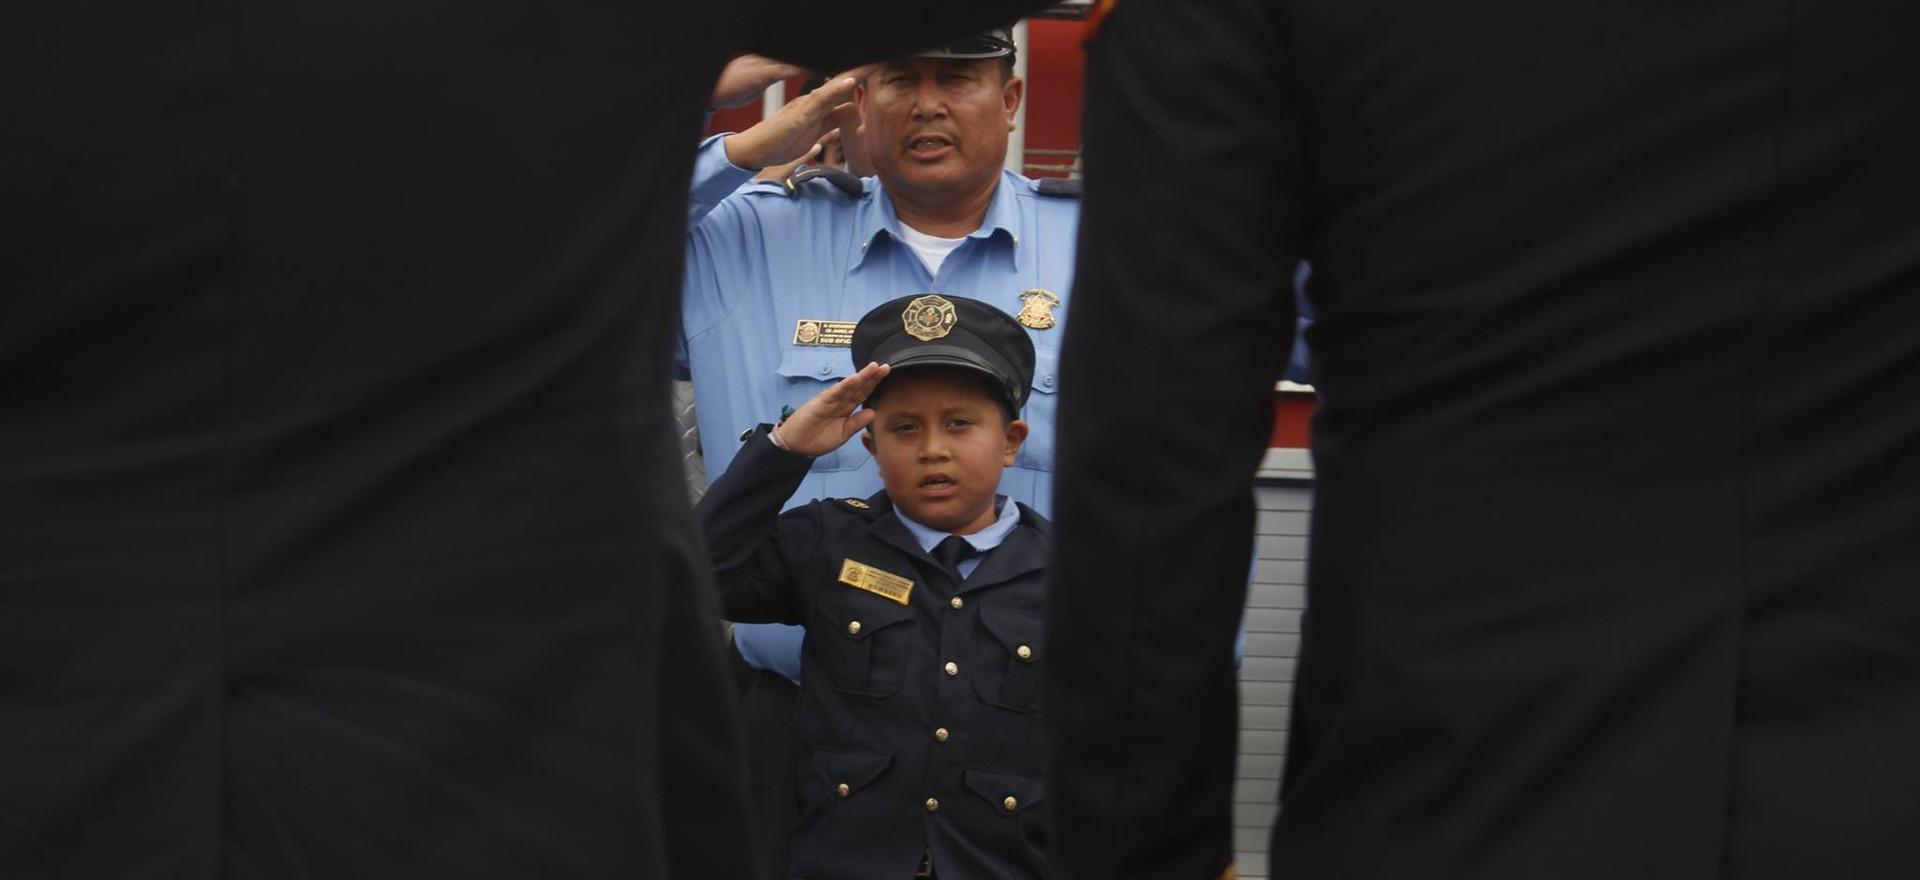 Niño bombero